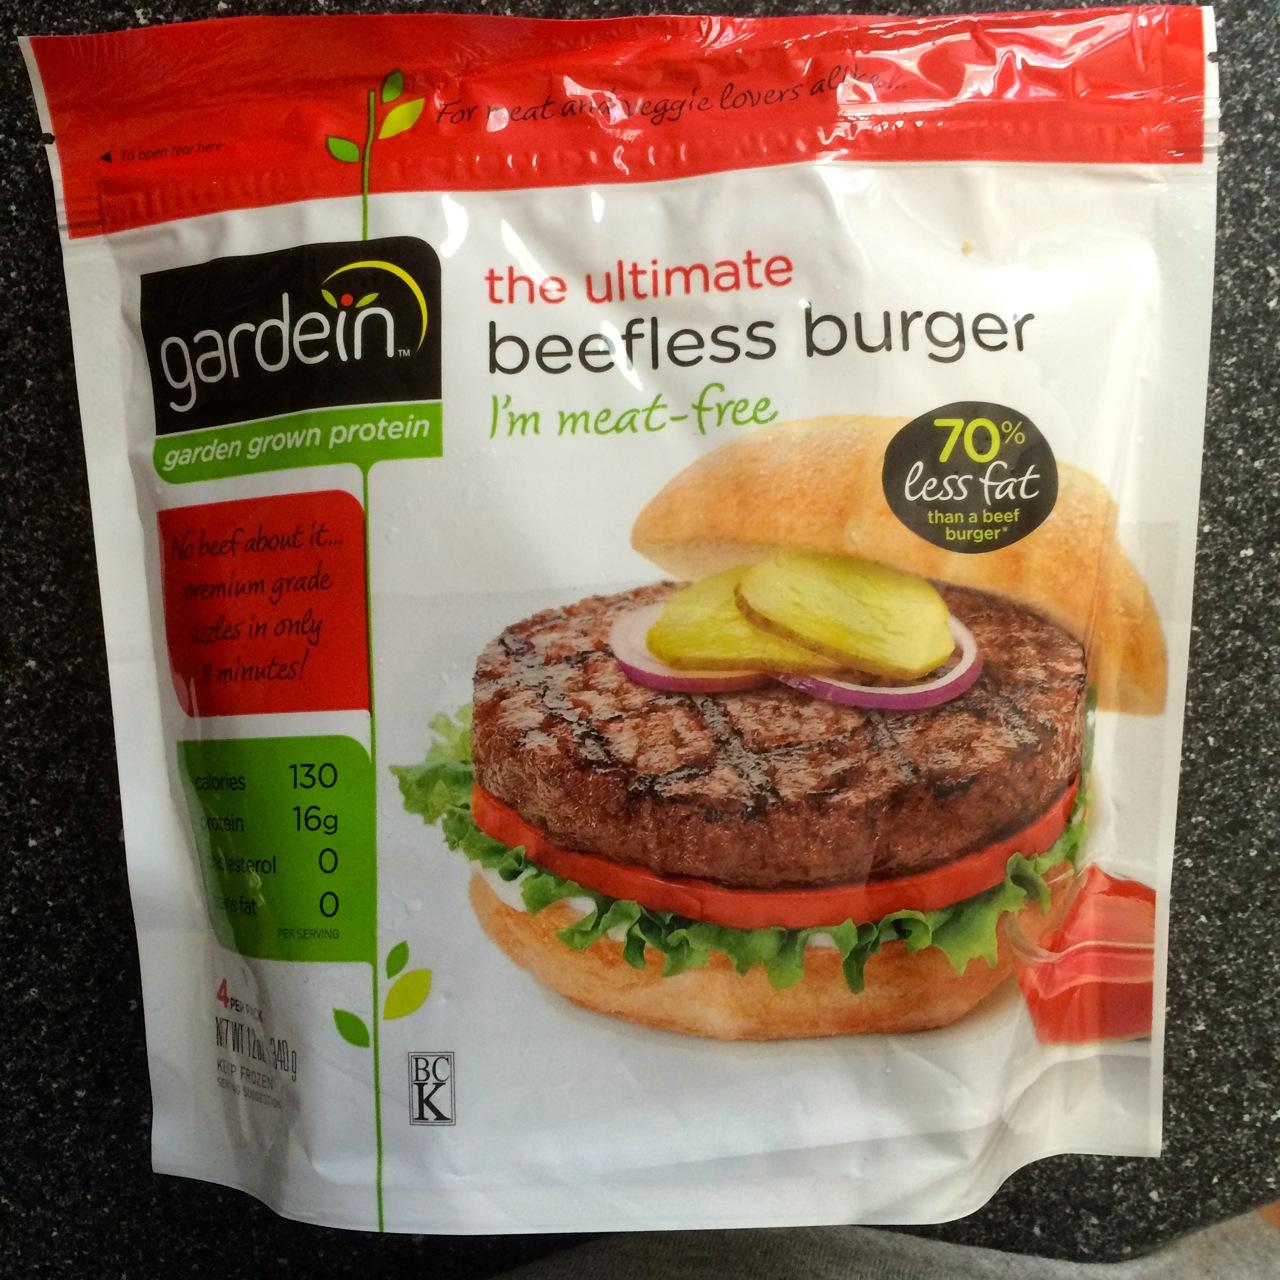 http://i1.wp.com/fatgayvegan.com/wp-content/uploads/2015/06/gardein-the-ultimate-beefless-burger.jpg?fit=1280%2C1280